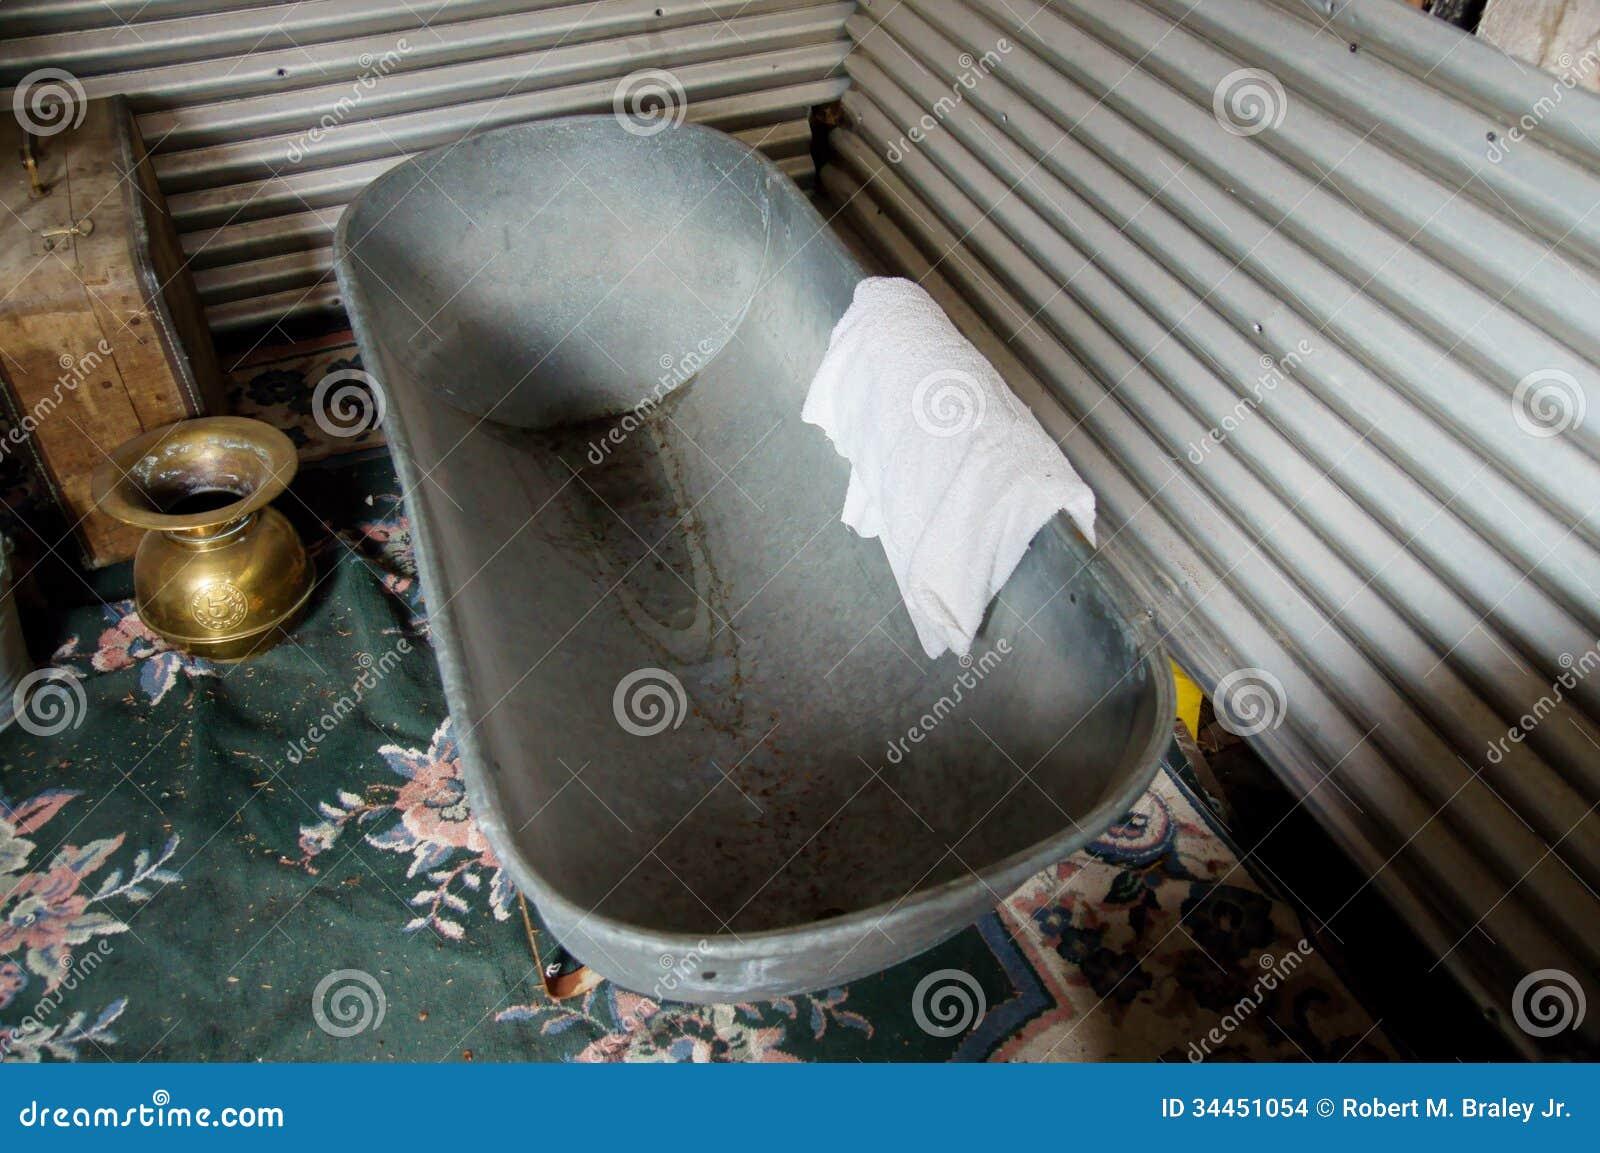 Vasca Da Bagno Usata Prezzi : Vasche da bagno antiche prezzi latest la di una nuova vasca